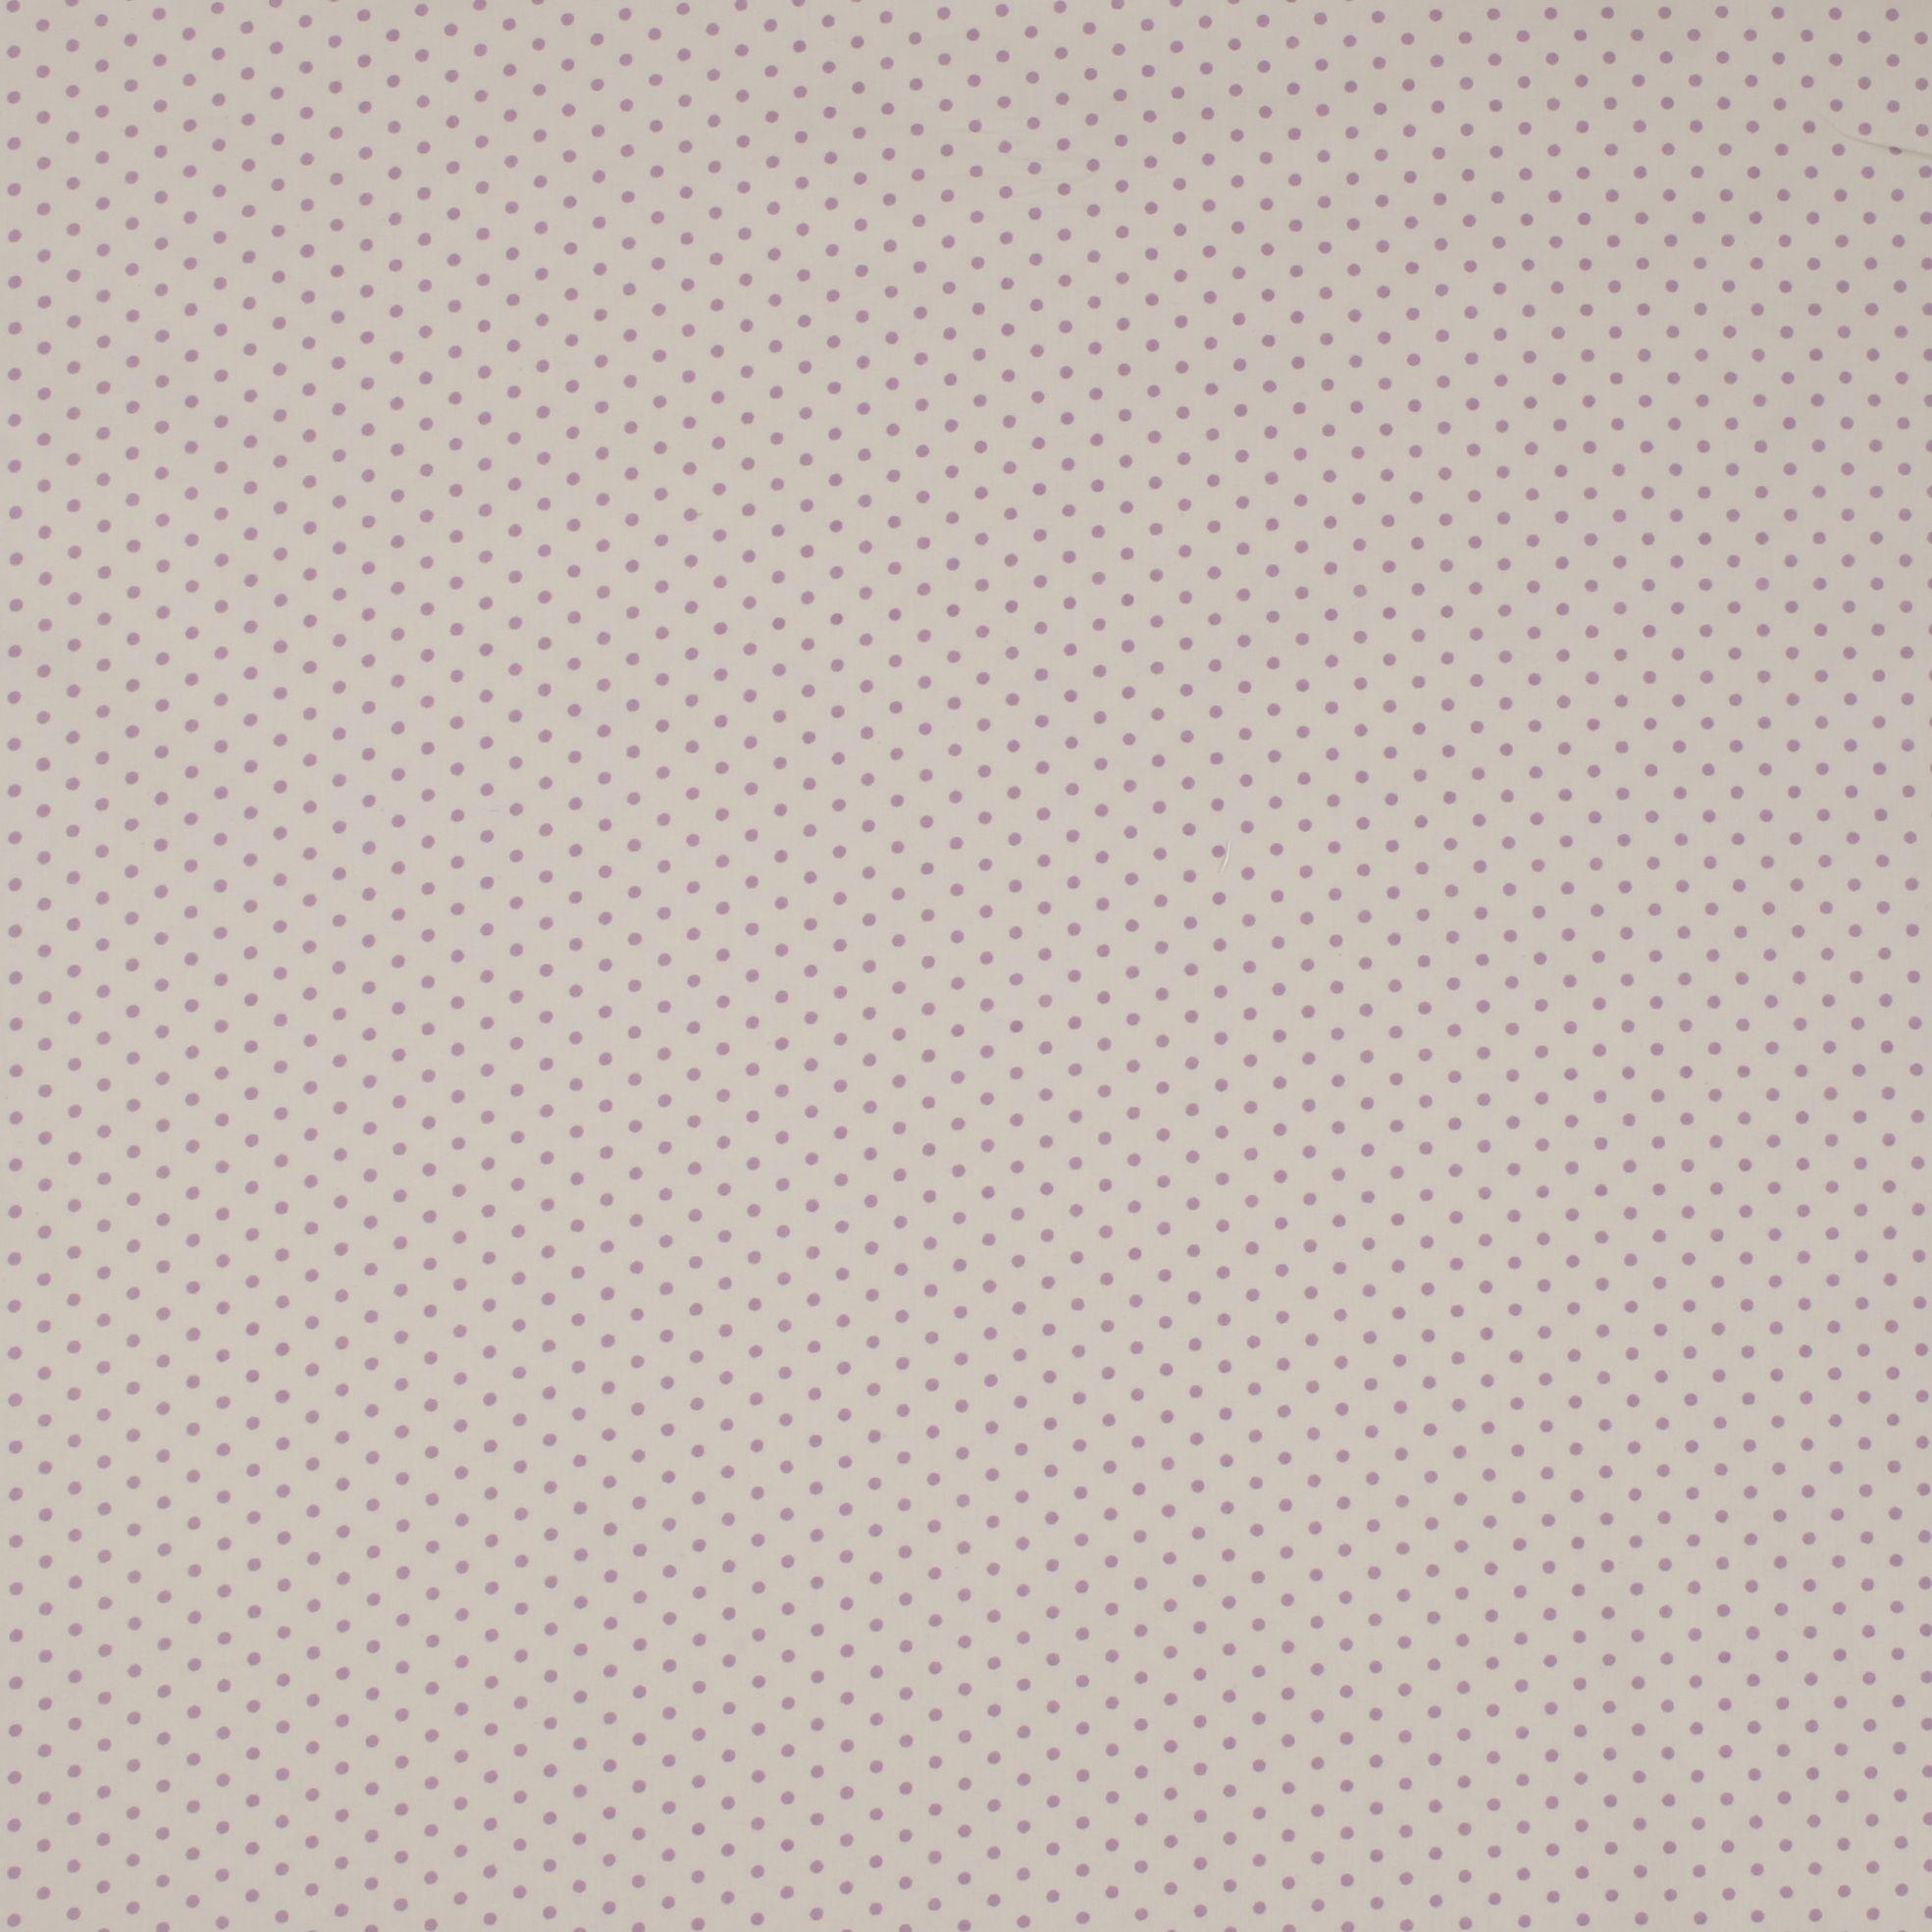 Ткань Dots , ширина 110см, в упаковке 1м, 100% хлопок. BDOT.YP55052Ткань Dots , ширина 110см, в упаковке 1м,100% хлопок